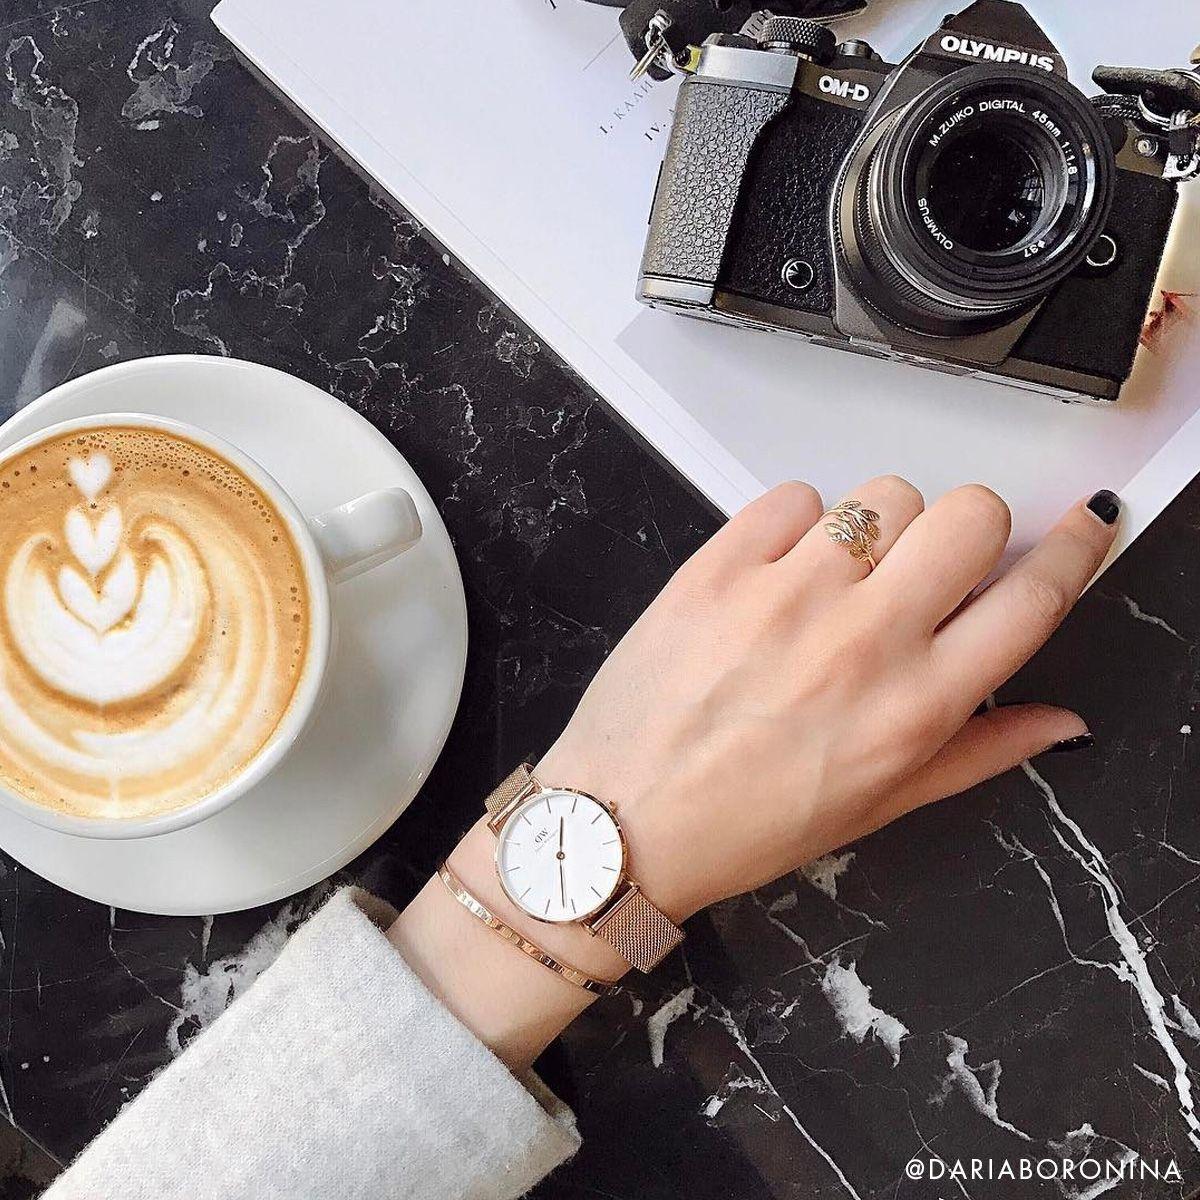 dw官网 dw手表官网 dw中国官网 dw官方旗舰店 DW DW官网  Watch Petite Melrose RG 28mm